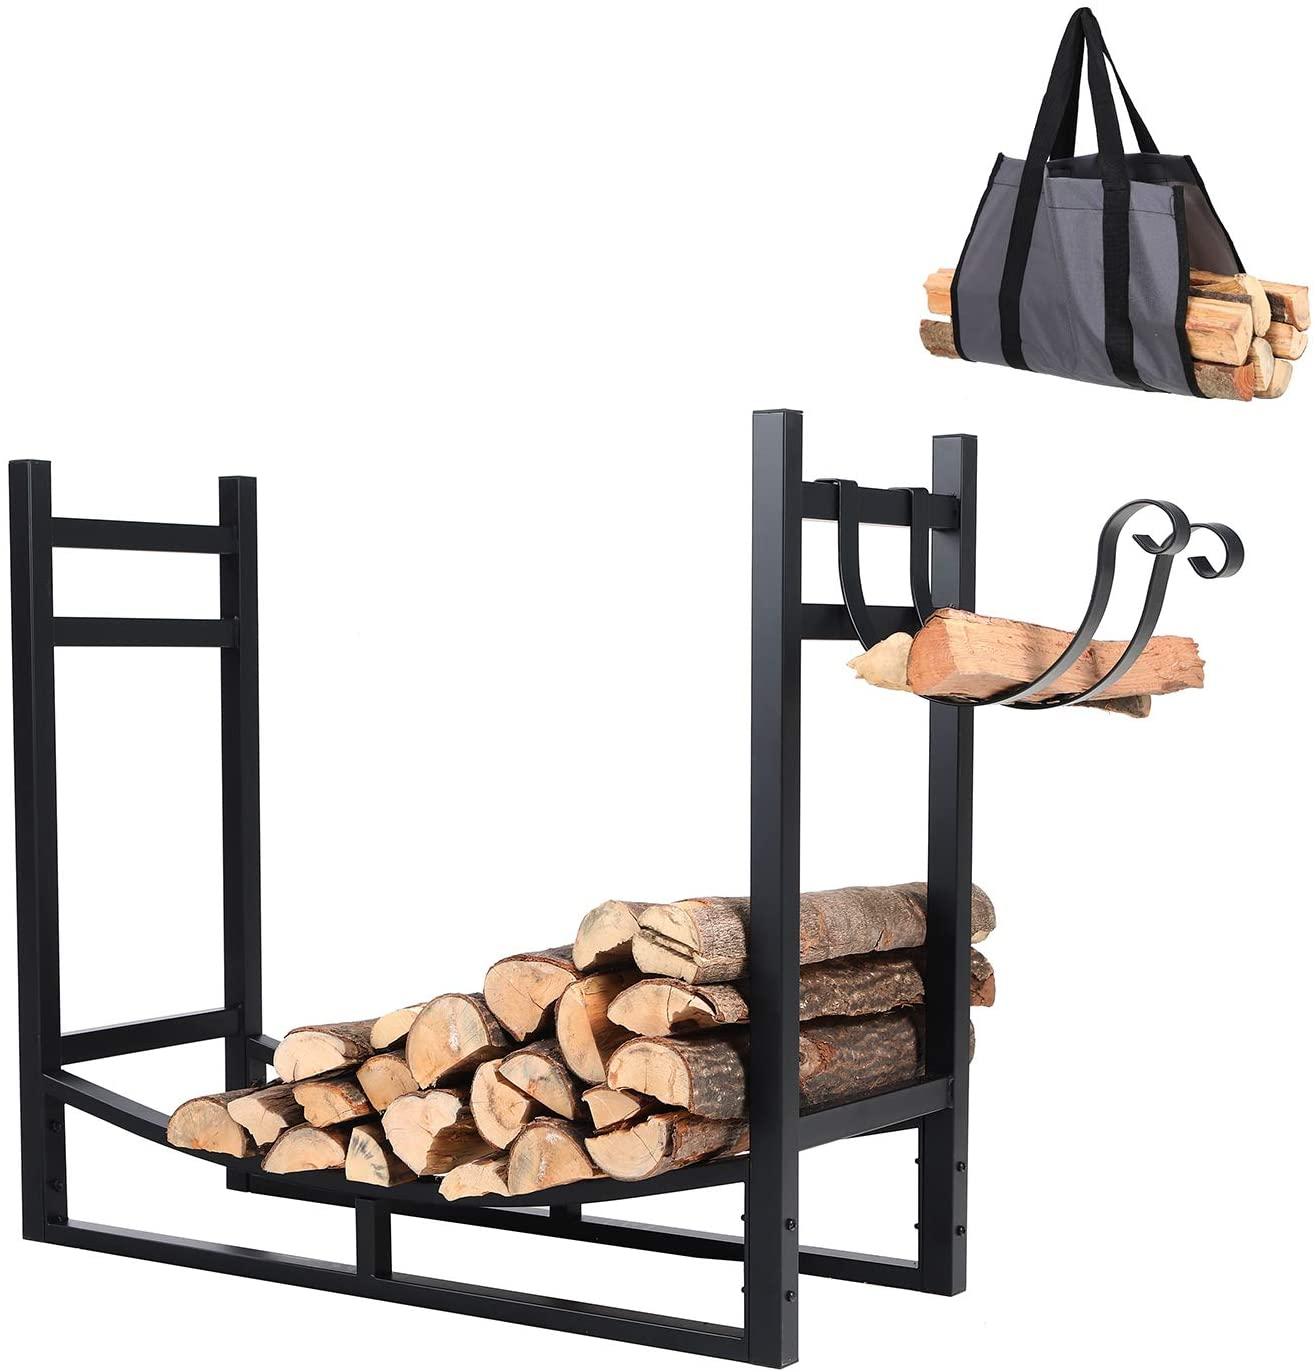 PHI VILLA Heavy Duty Firewood Racks